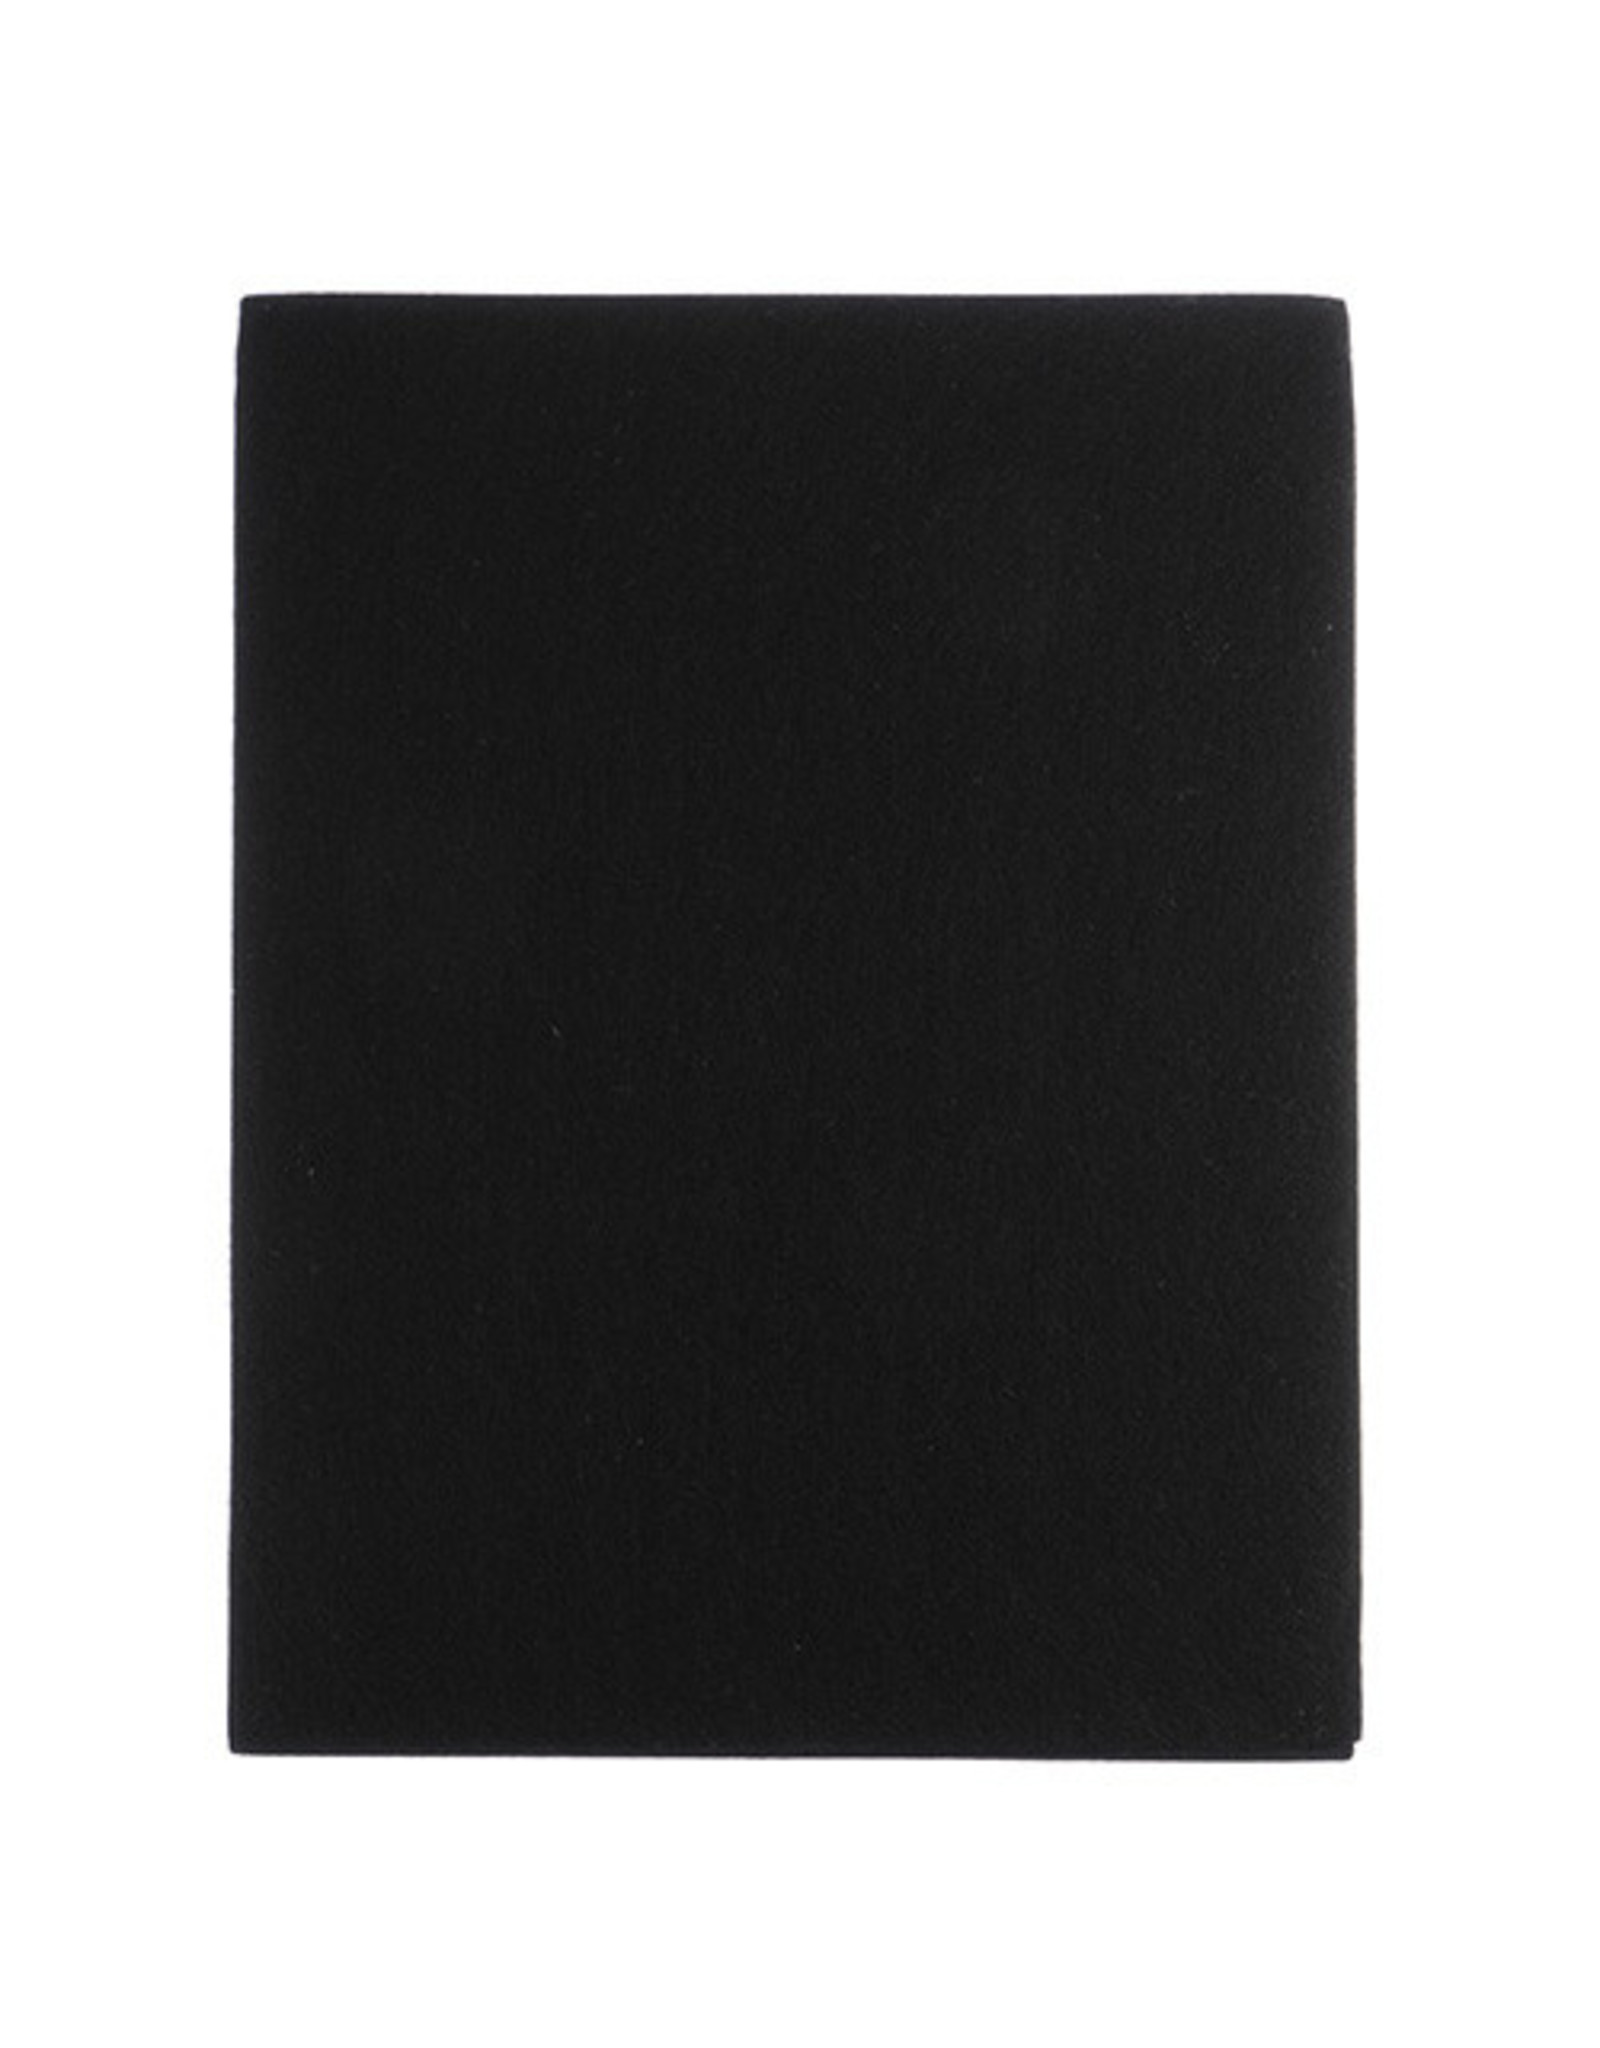 "Felt Beading Foundation Black 1.5mm thick 8.5x11"" Sheet"